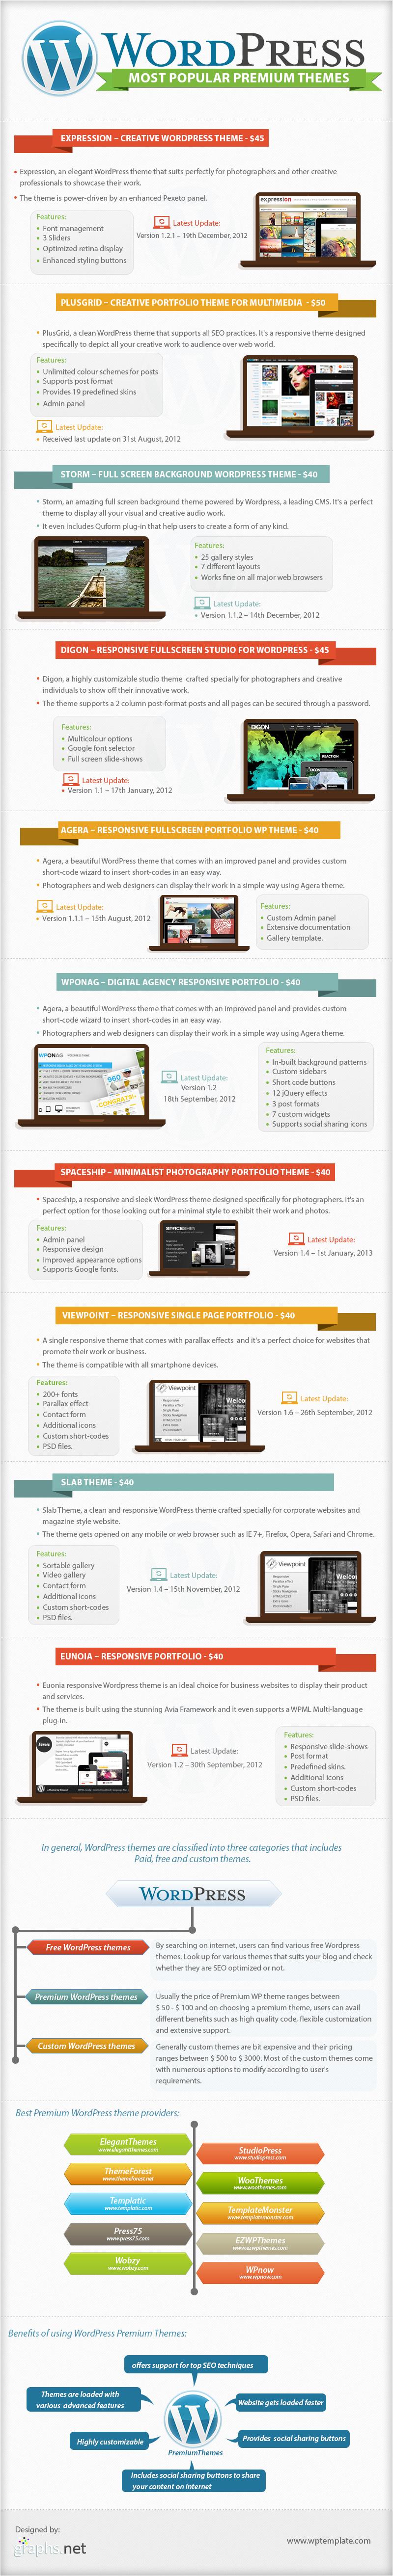 Top Premium Themes of WordPress